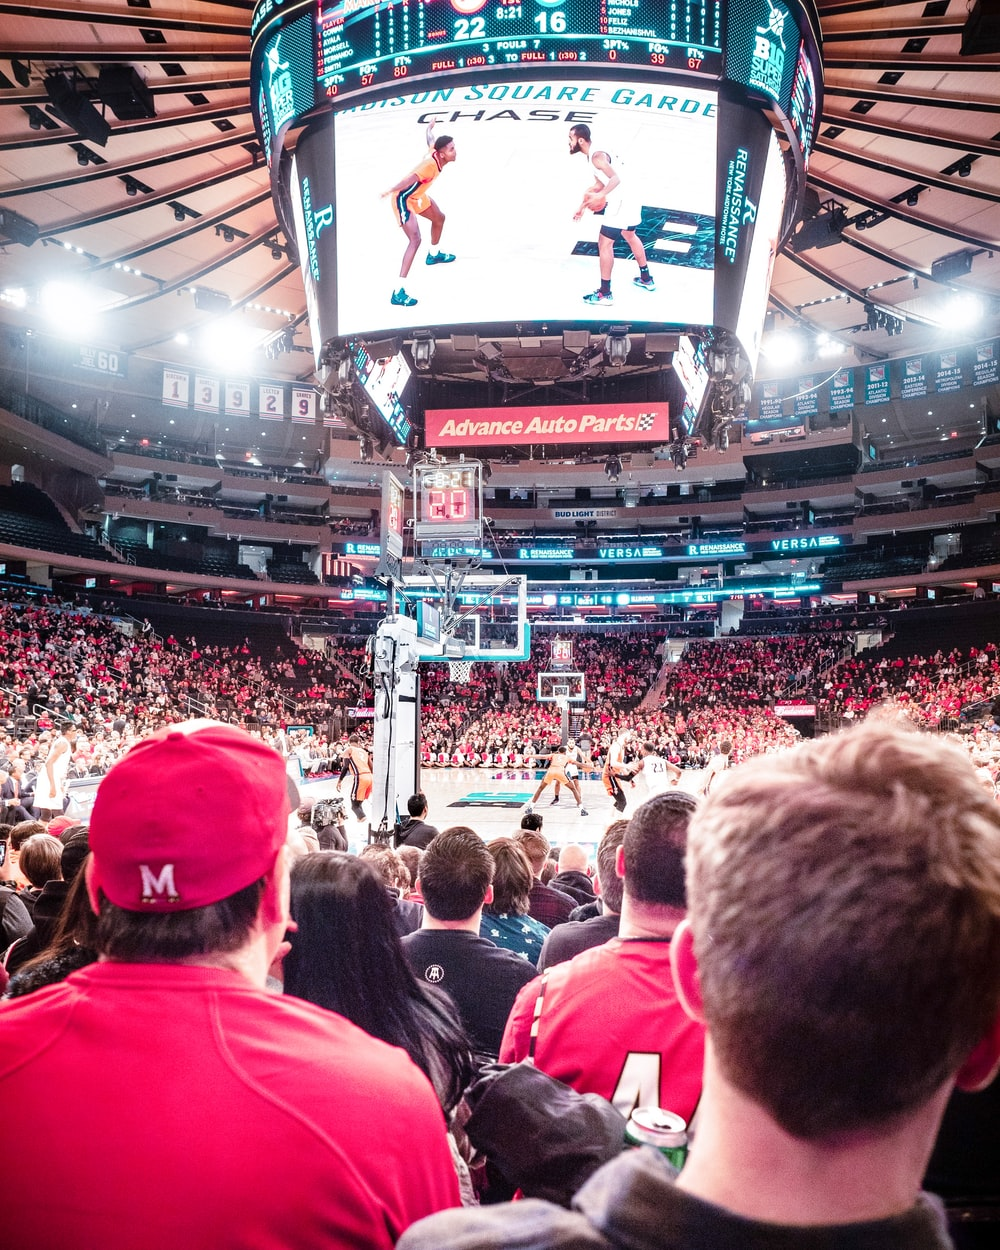 people watching NBA